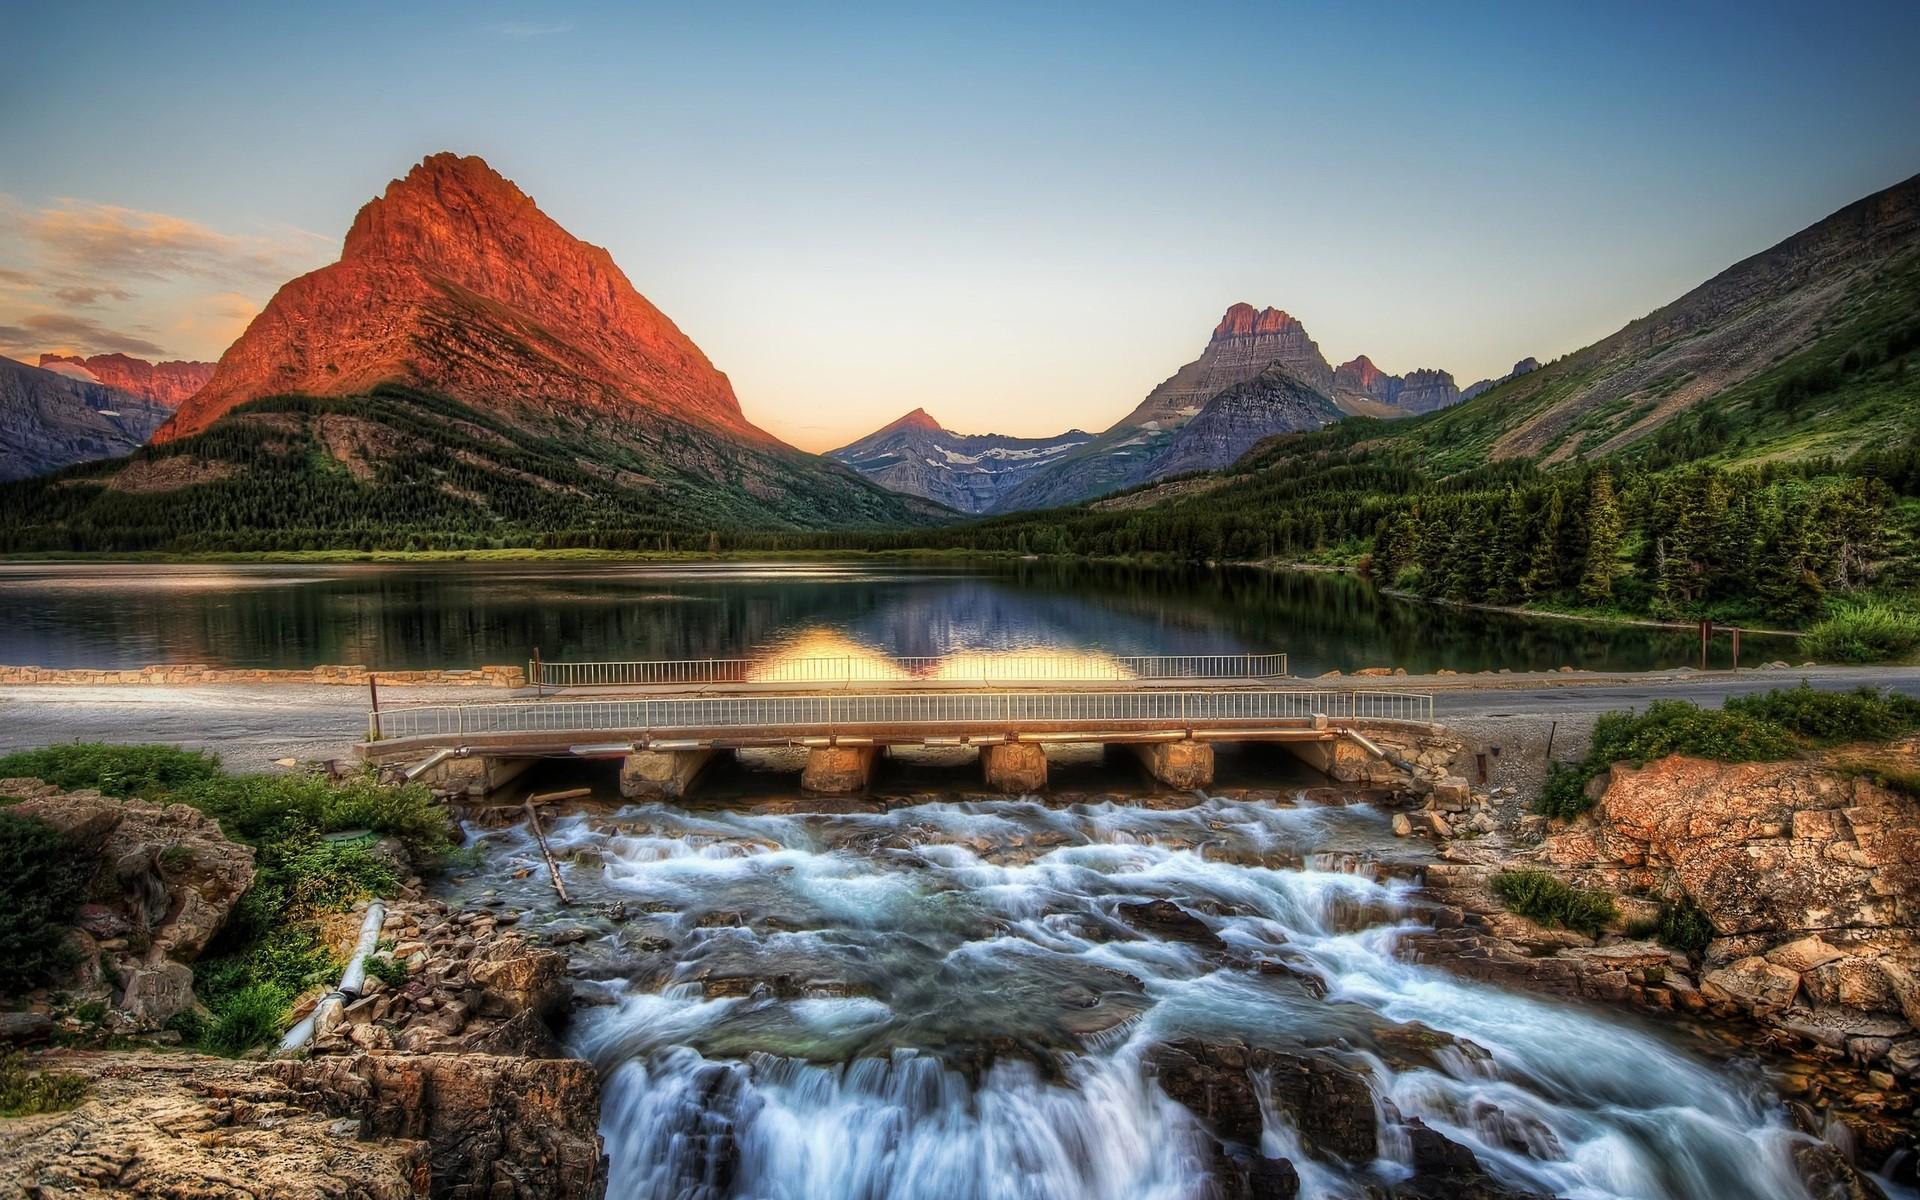 Wallpaper Usa Nature Montana Nature PicsFabcom   Desktop 1920x1200